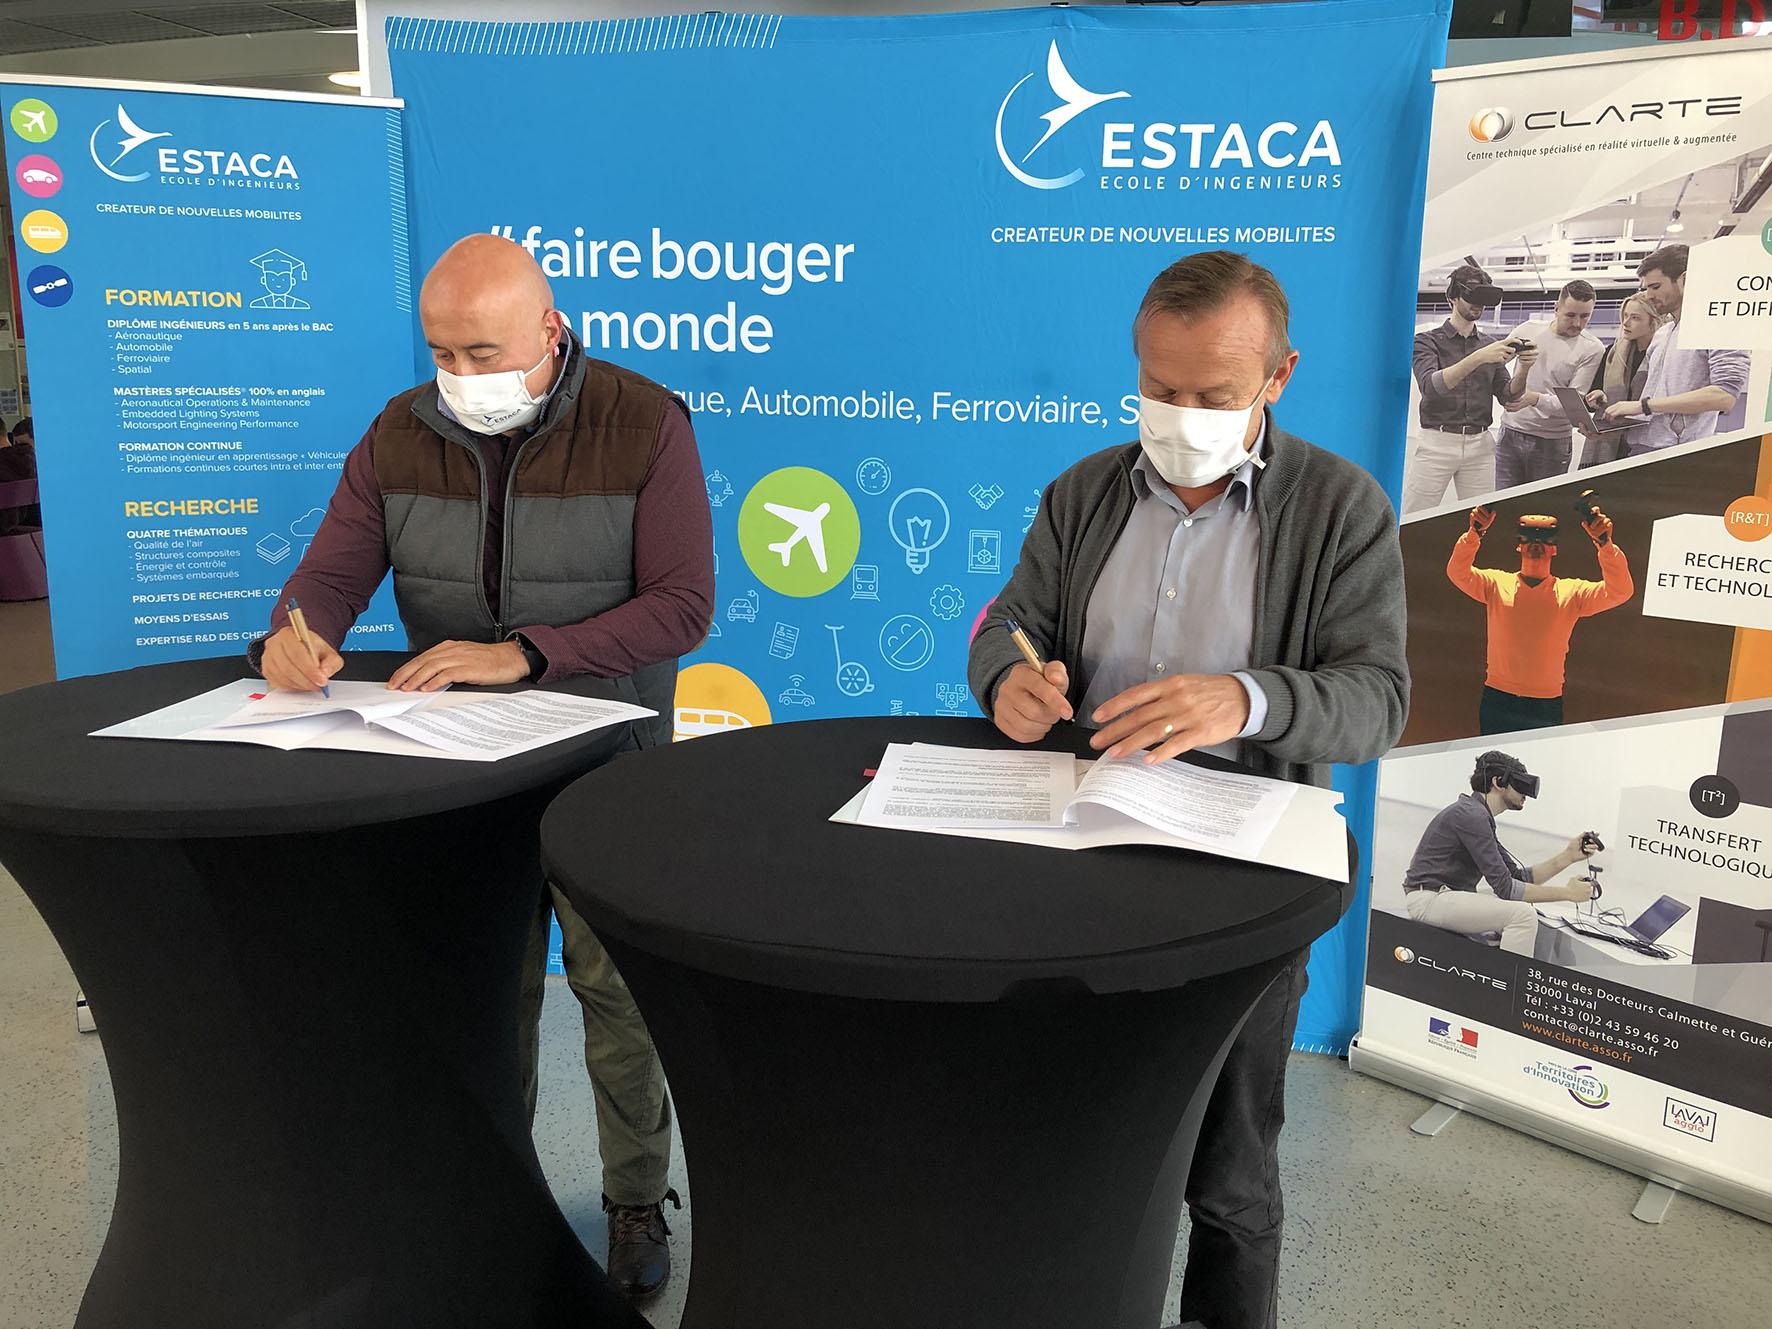 Signature of the partnership between ESTACA and CLARTE